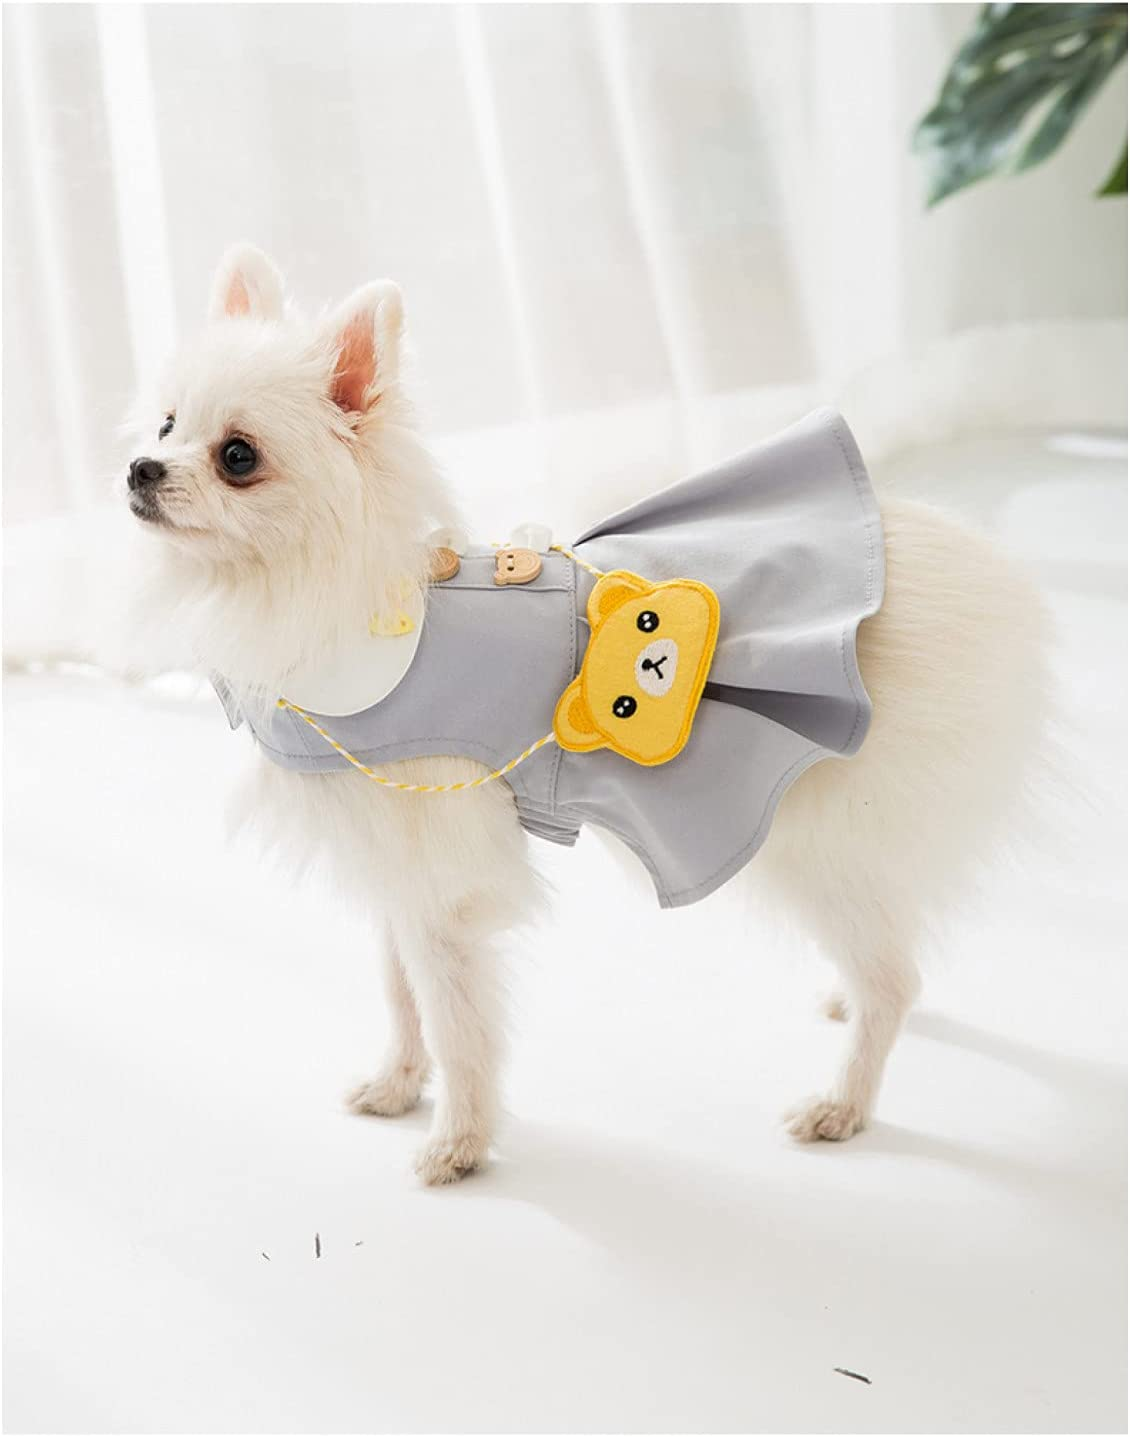 MDKAZ Clothes for Pets Dog Skirt Genuine Max 53% OFF Summer Smal Dresses